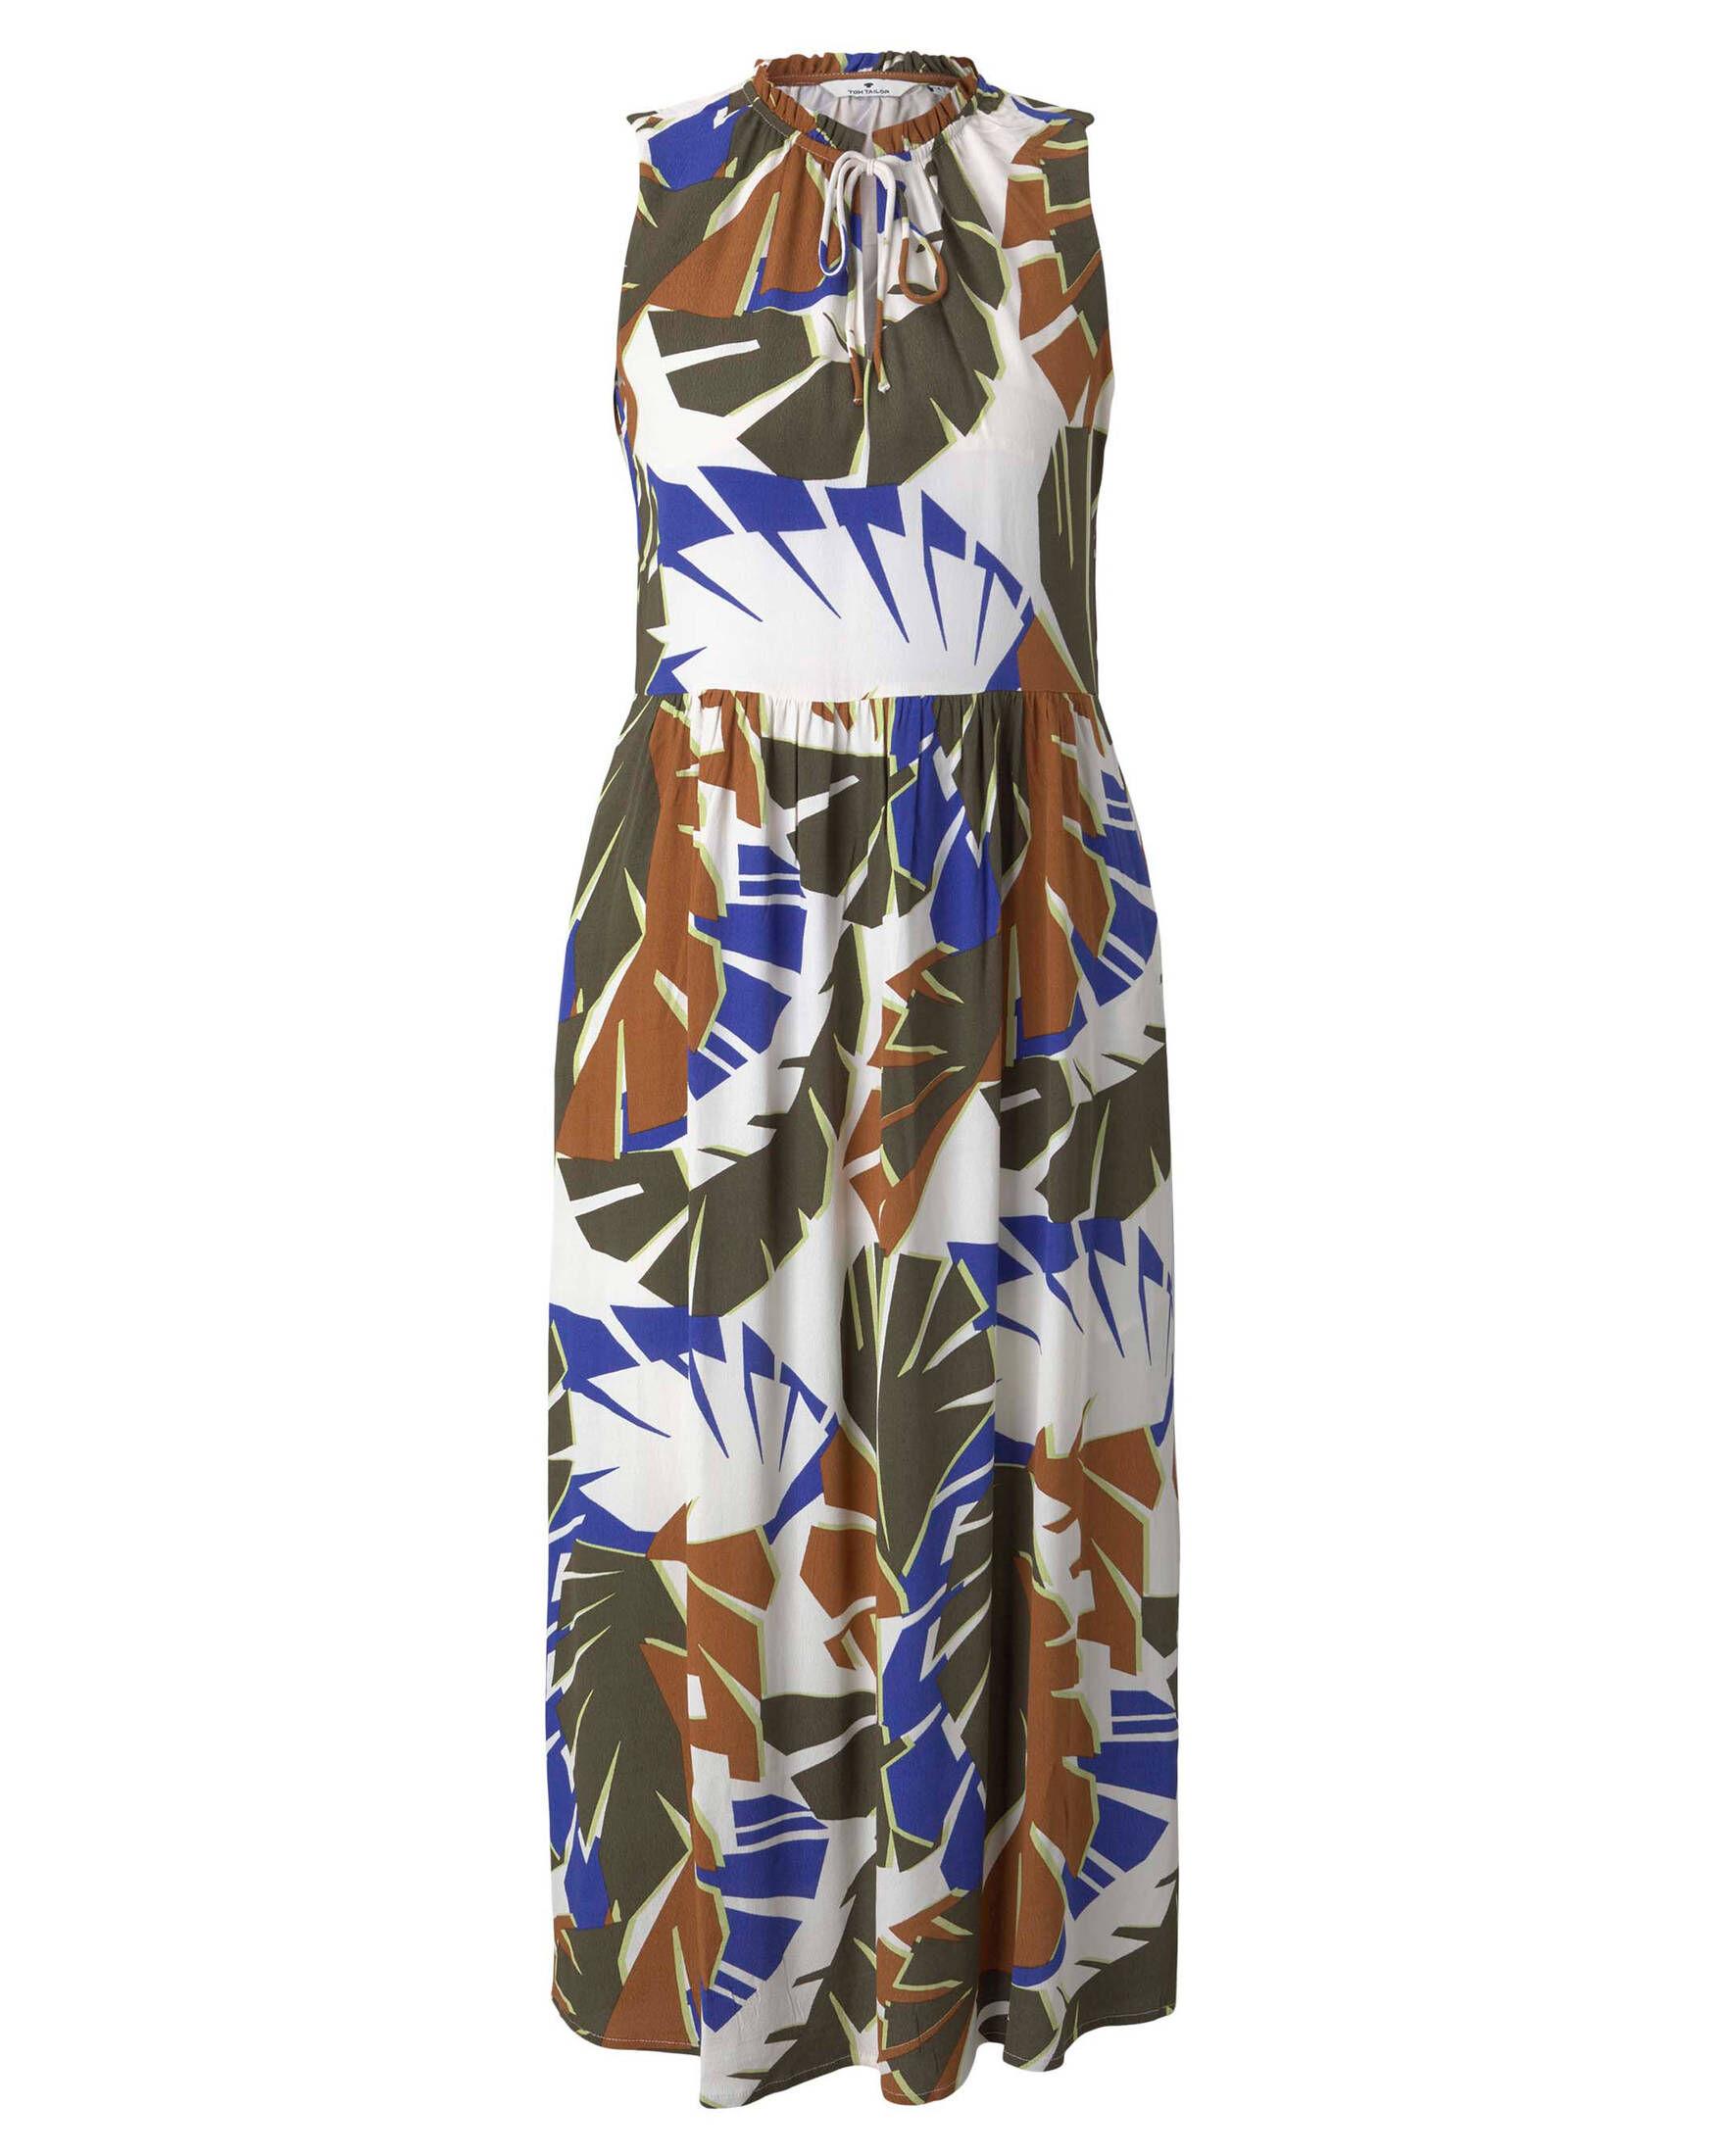 Tom Tailor Damen Kleid Ärmellos kaufen   engelhorn